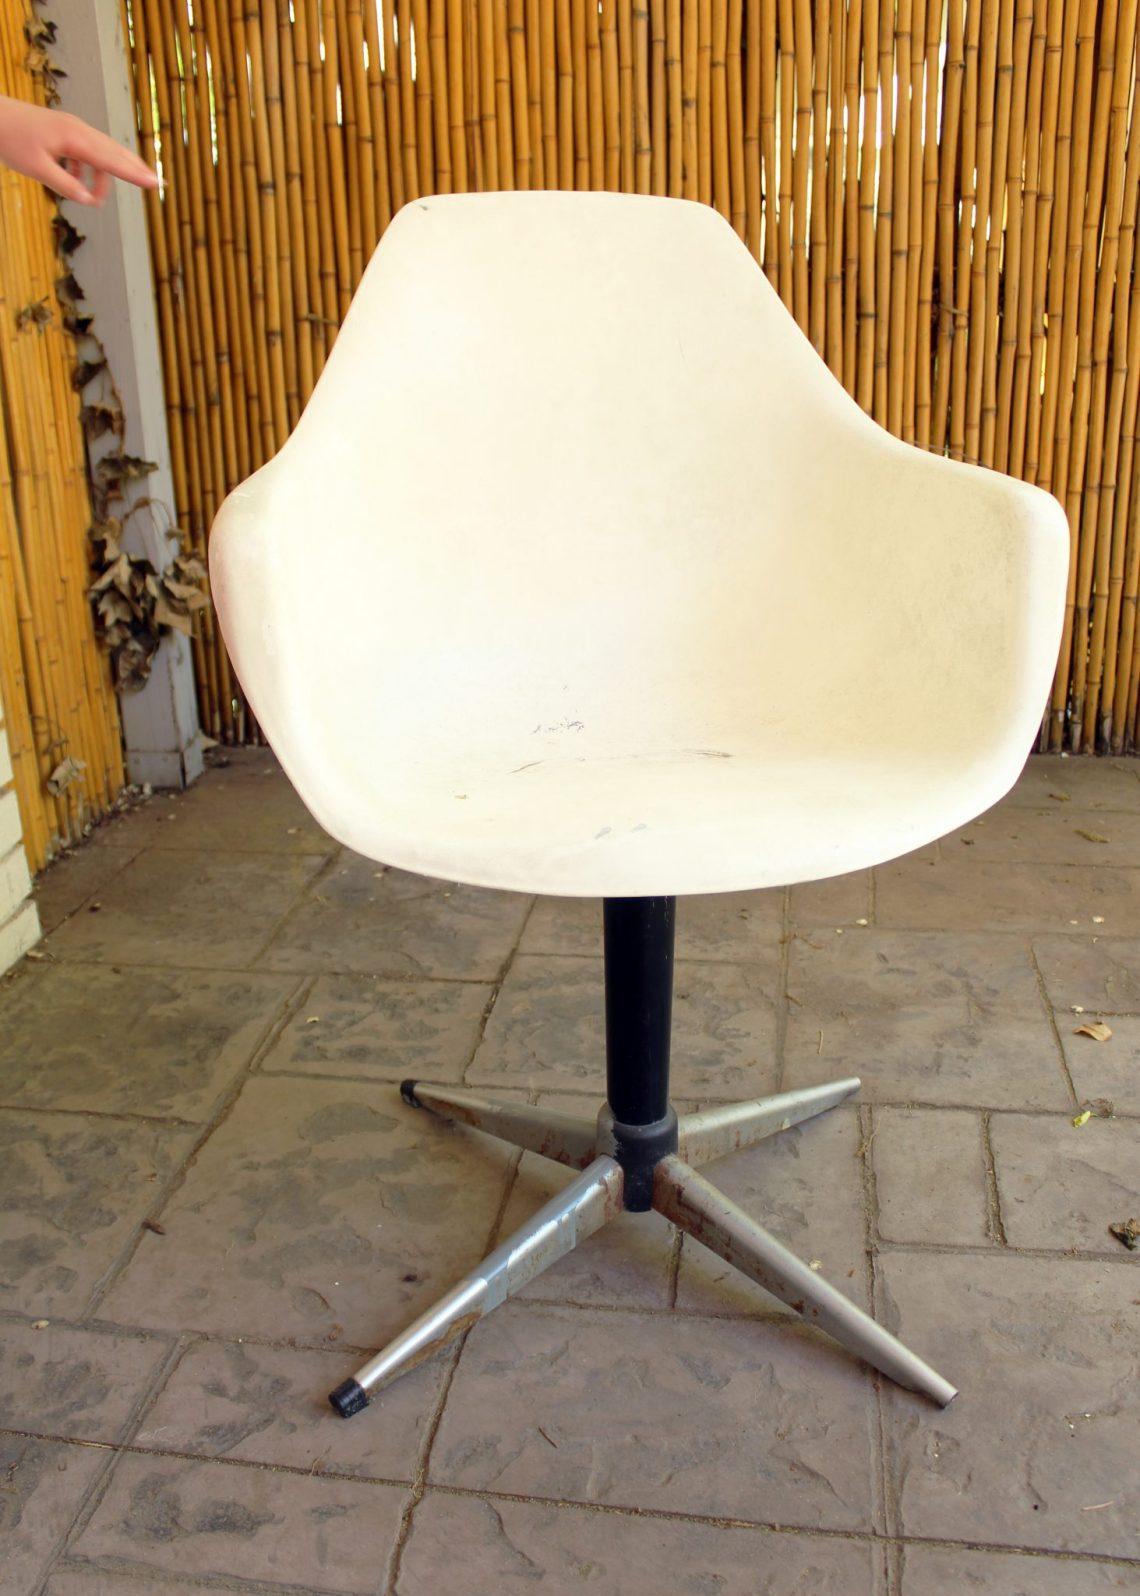 Before DIY Midcentury Modern Chair Makeover Tutorial